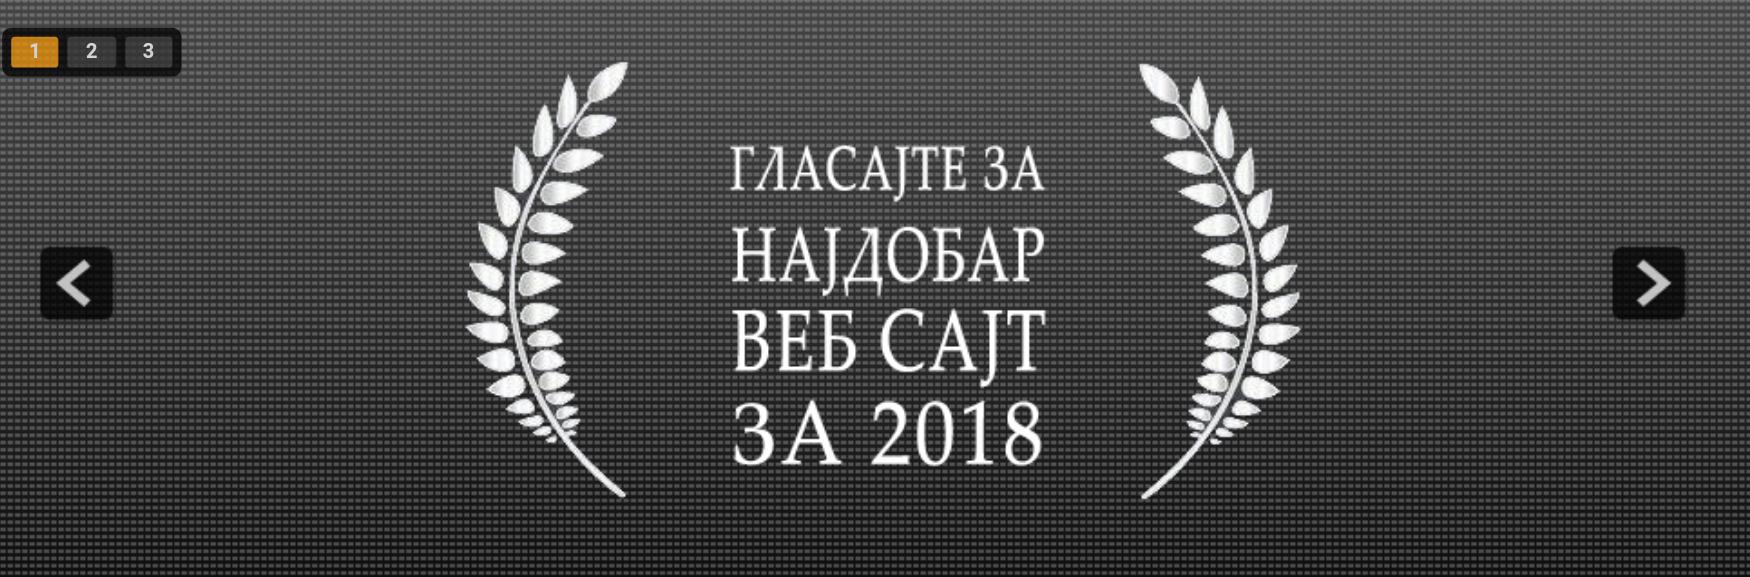 Избор на сајт на годината 2018